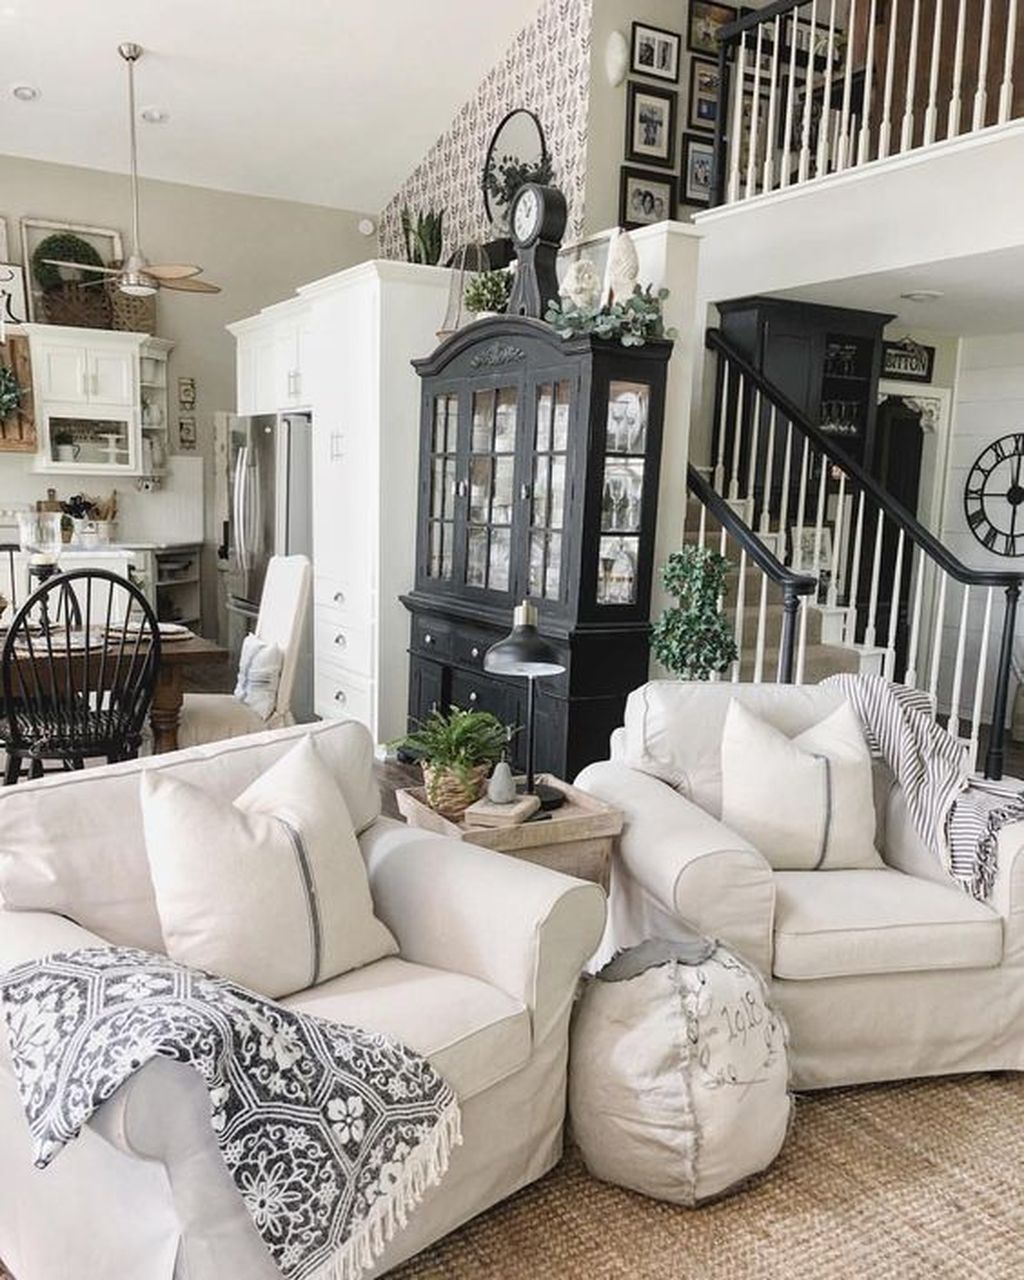 35 Inspiring Living Room Decorating Ideas images